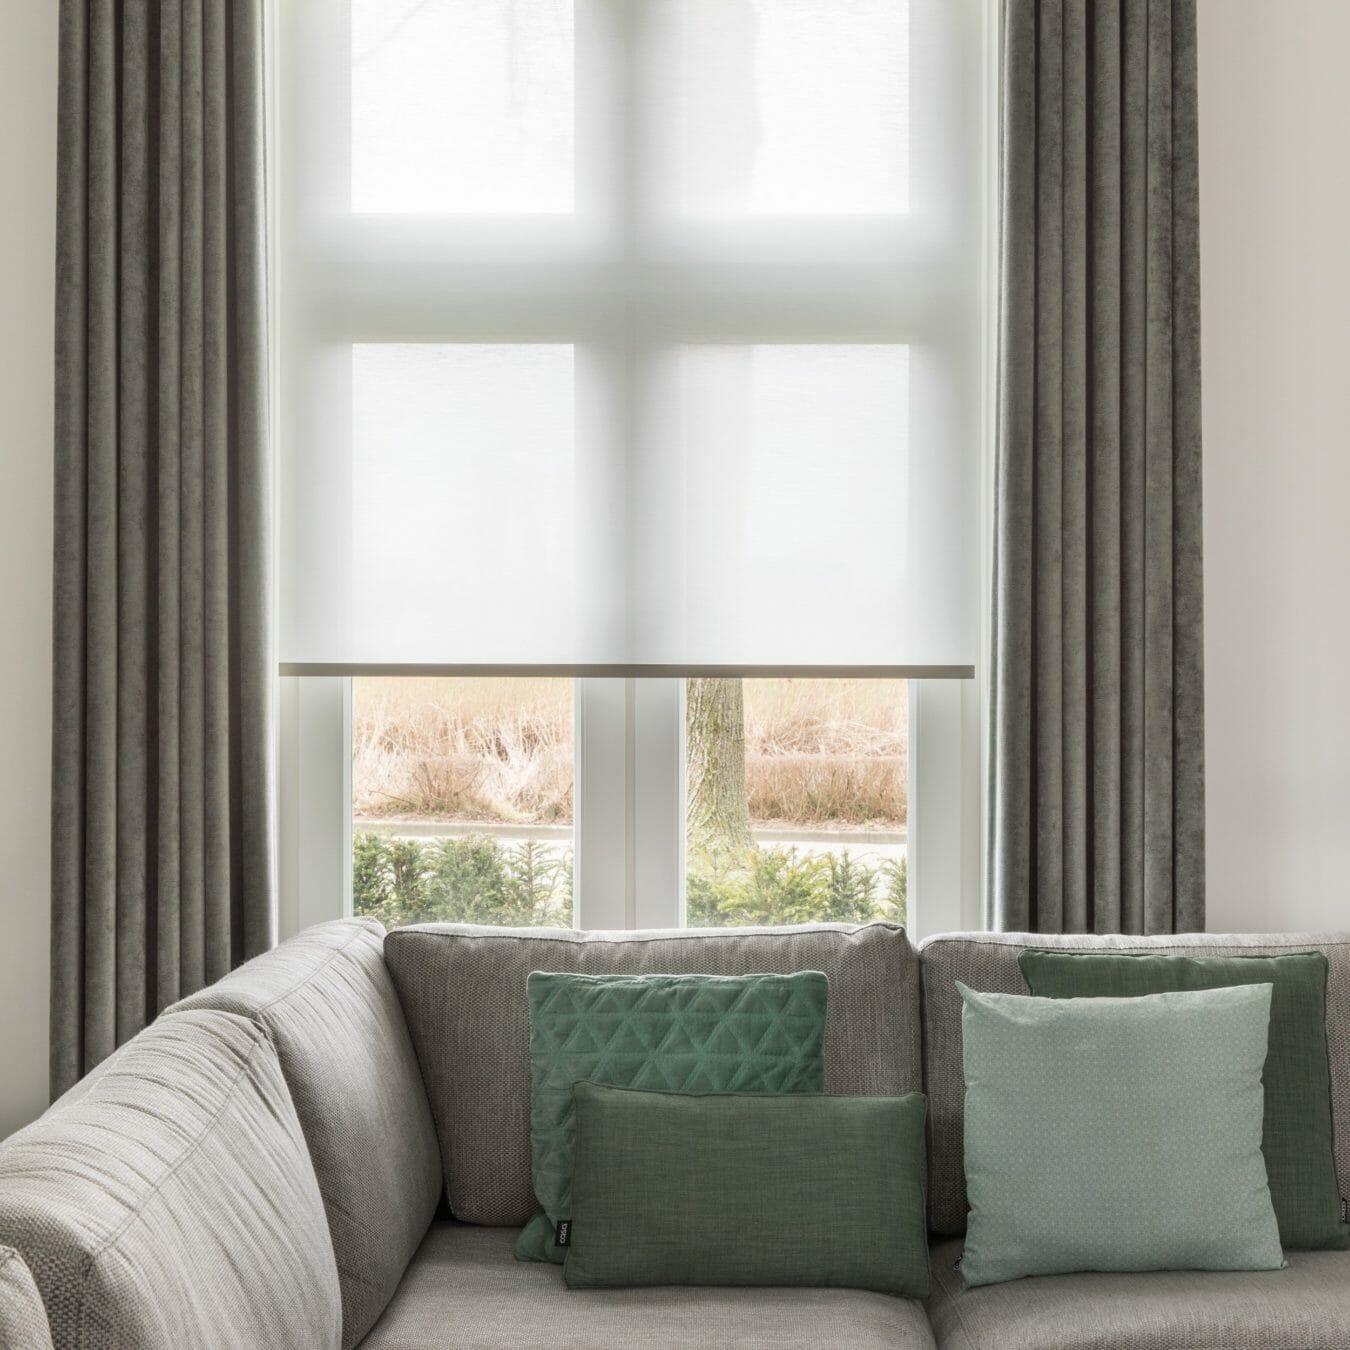 Transparant rolgordijn in woonkamer